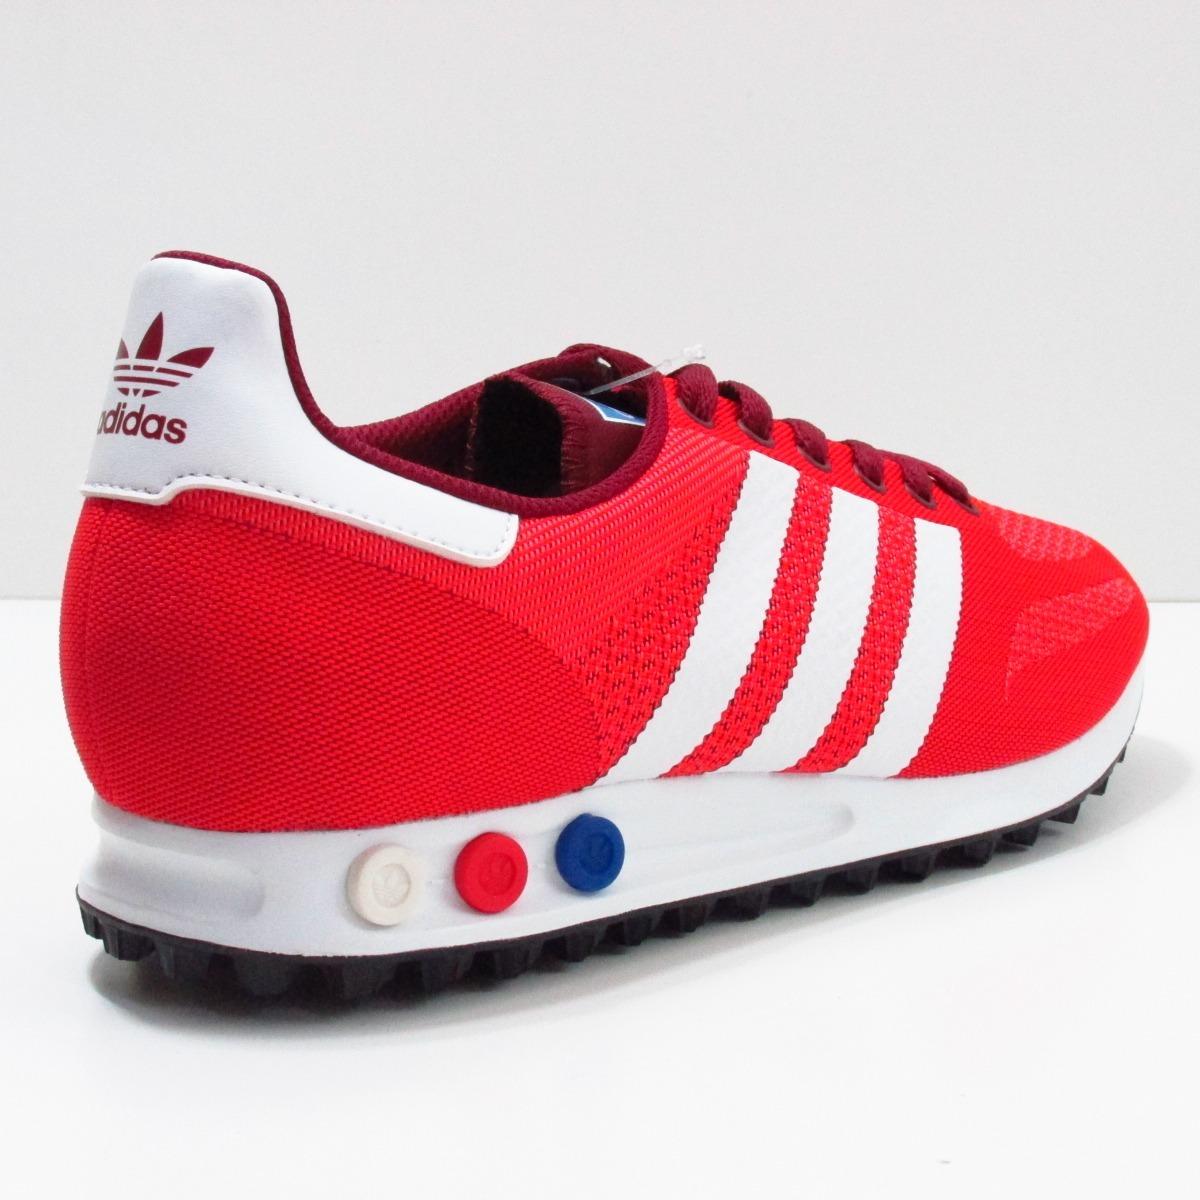 Carregando zoom... tênis masculino adidas originals la trainer produto  europeu 706de91a5c94b